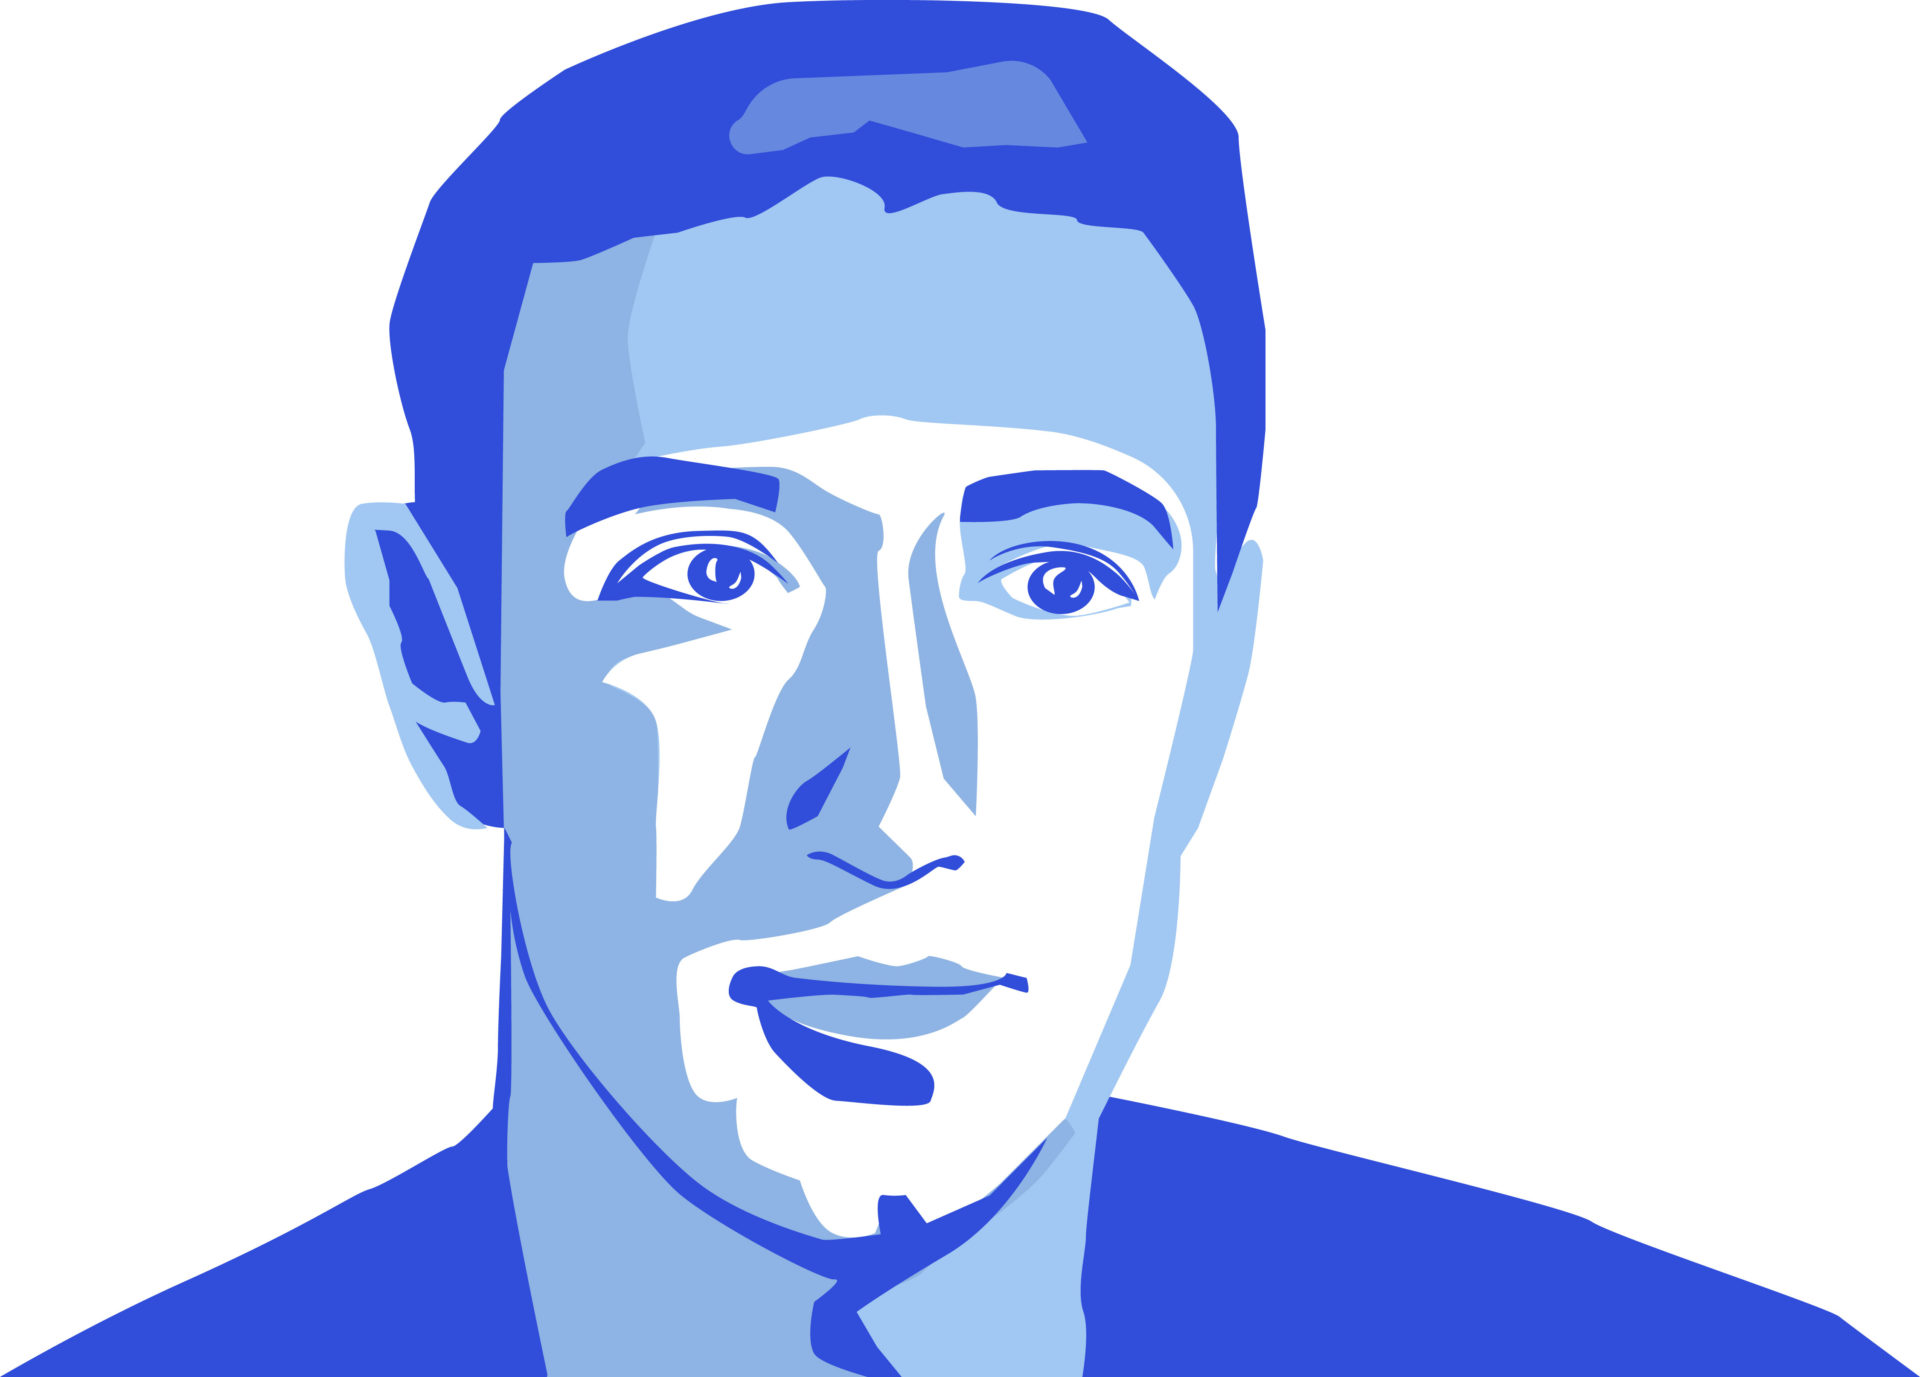 Facebook cryptocurrency Winklevoss twins Zuckerberg